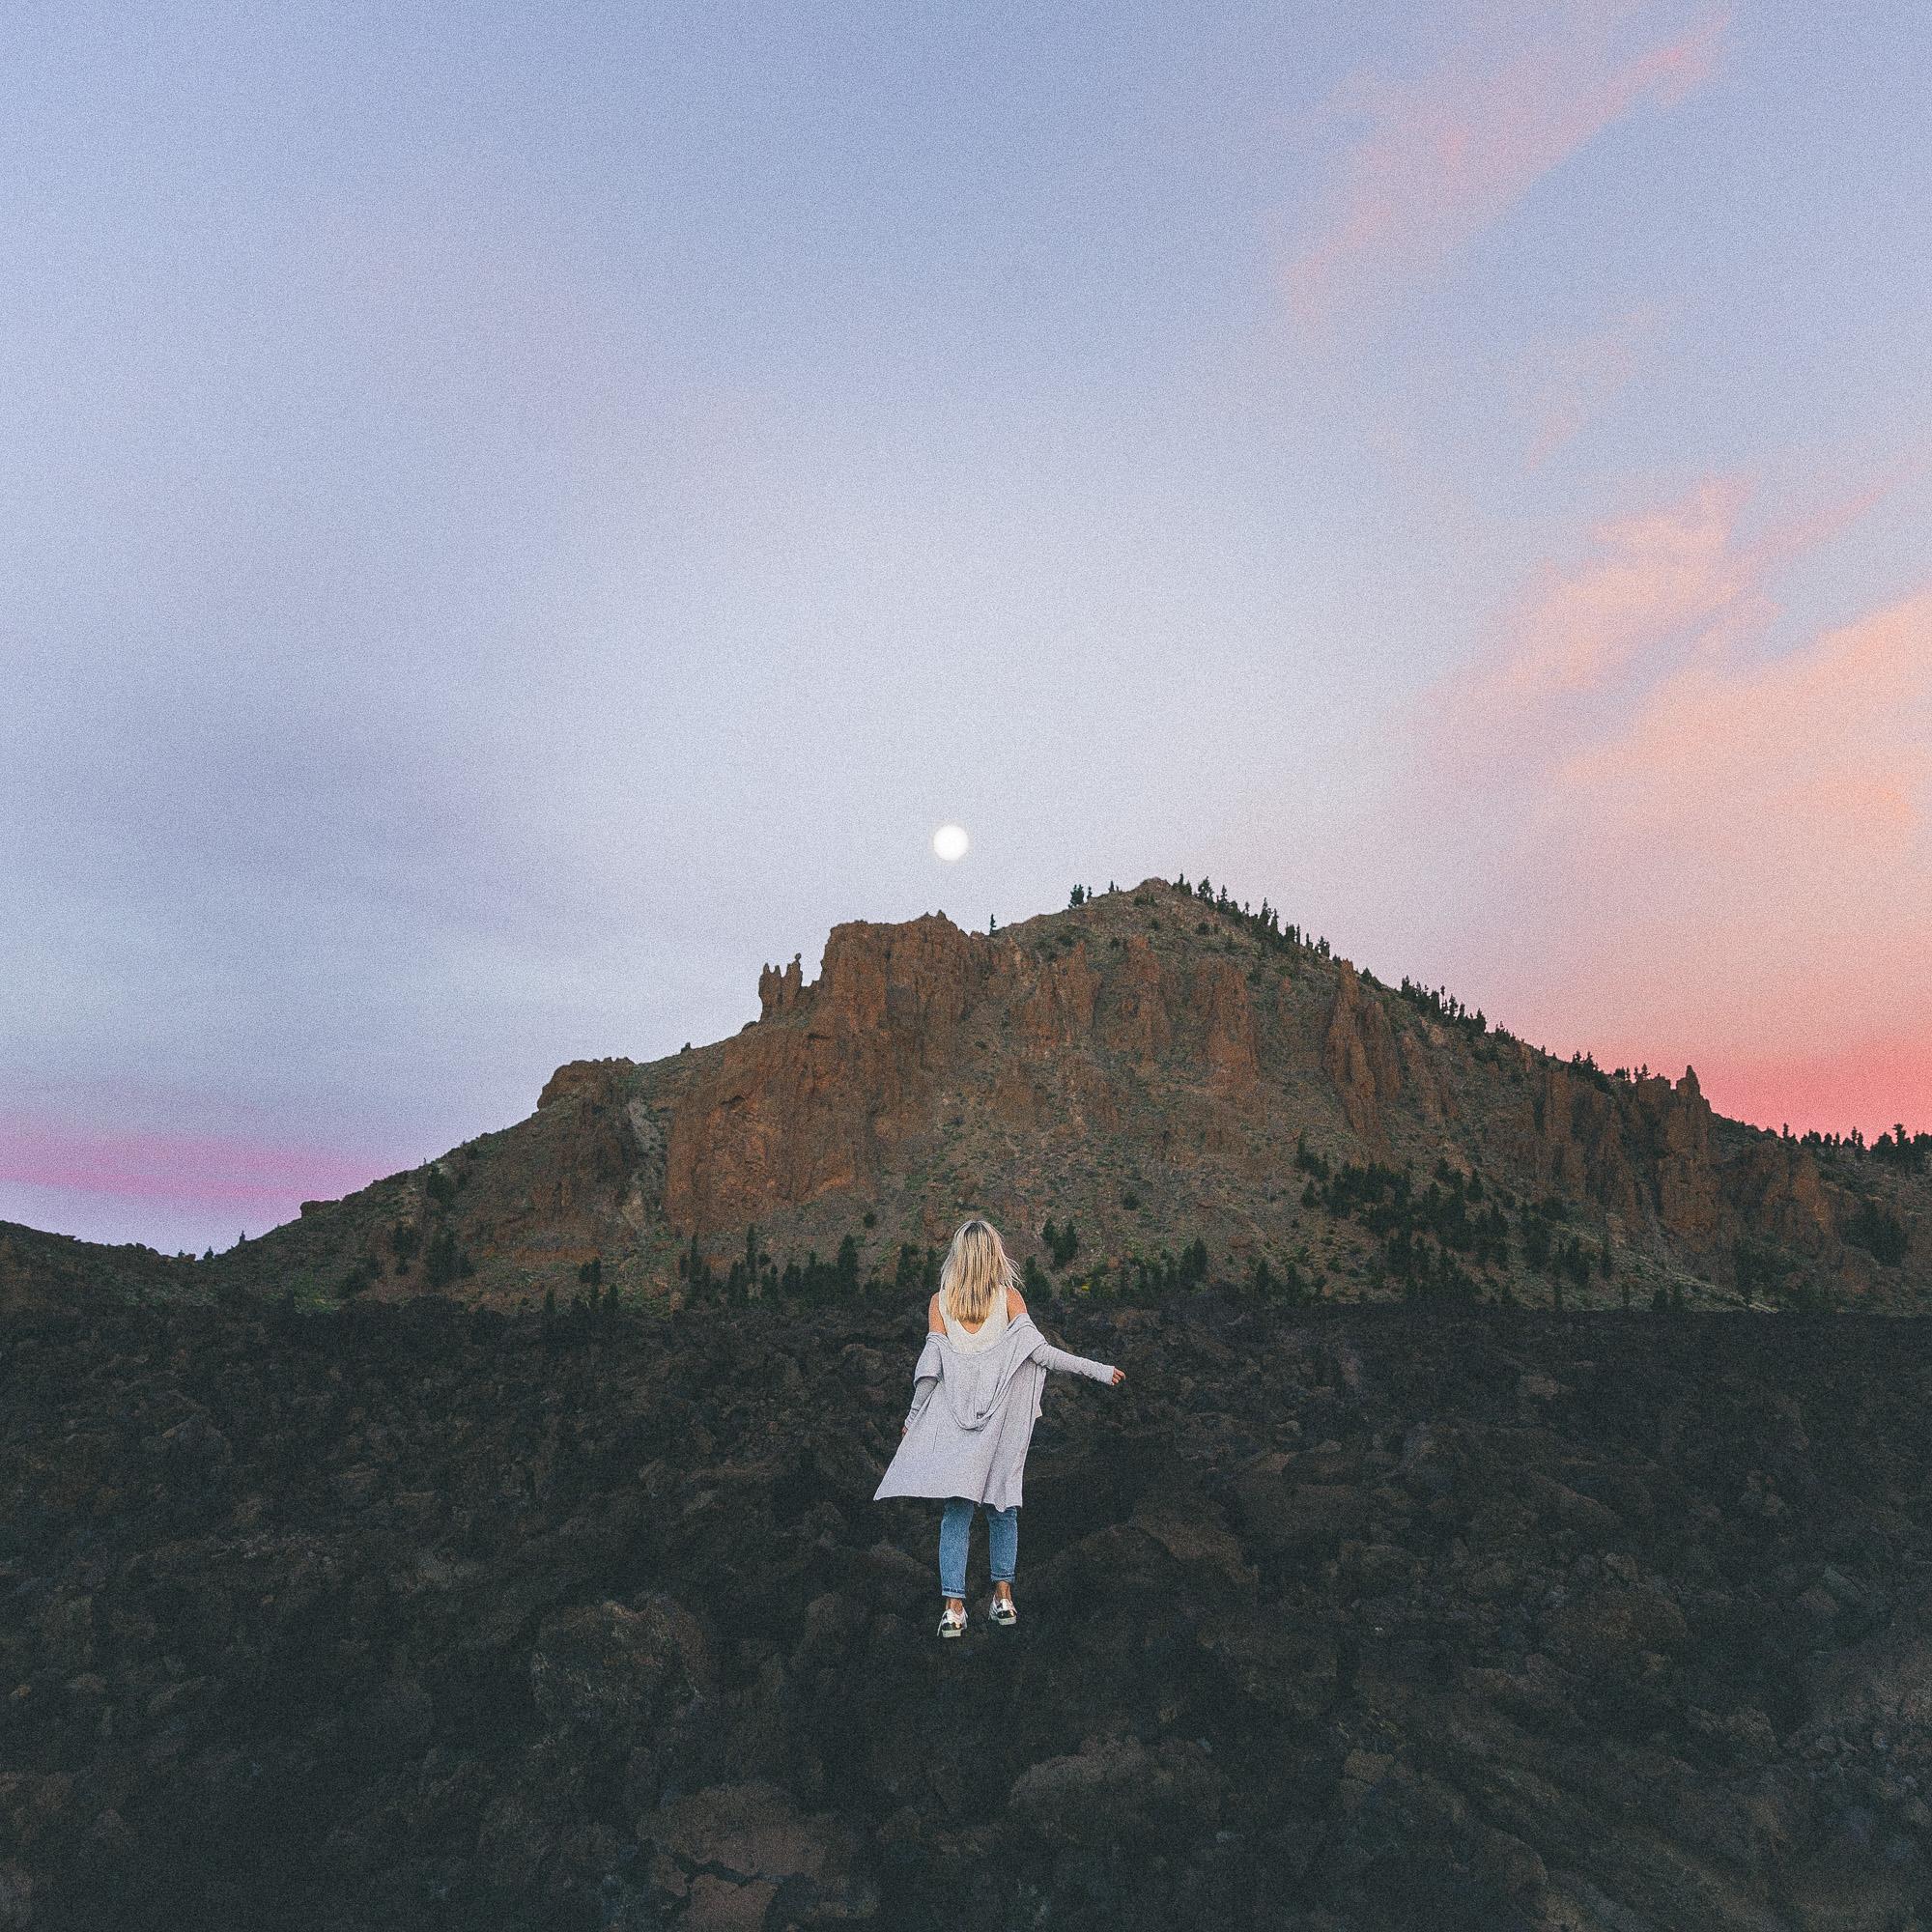 Exploring El Teide Volcano in Tenerife at sunrise, Canary Islands, Spain